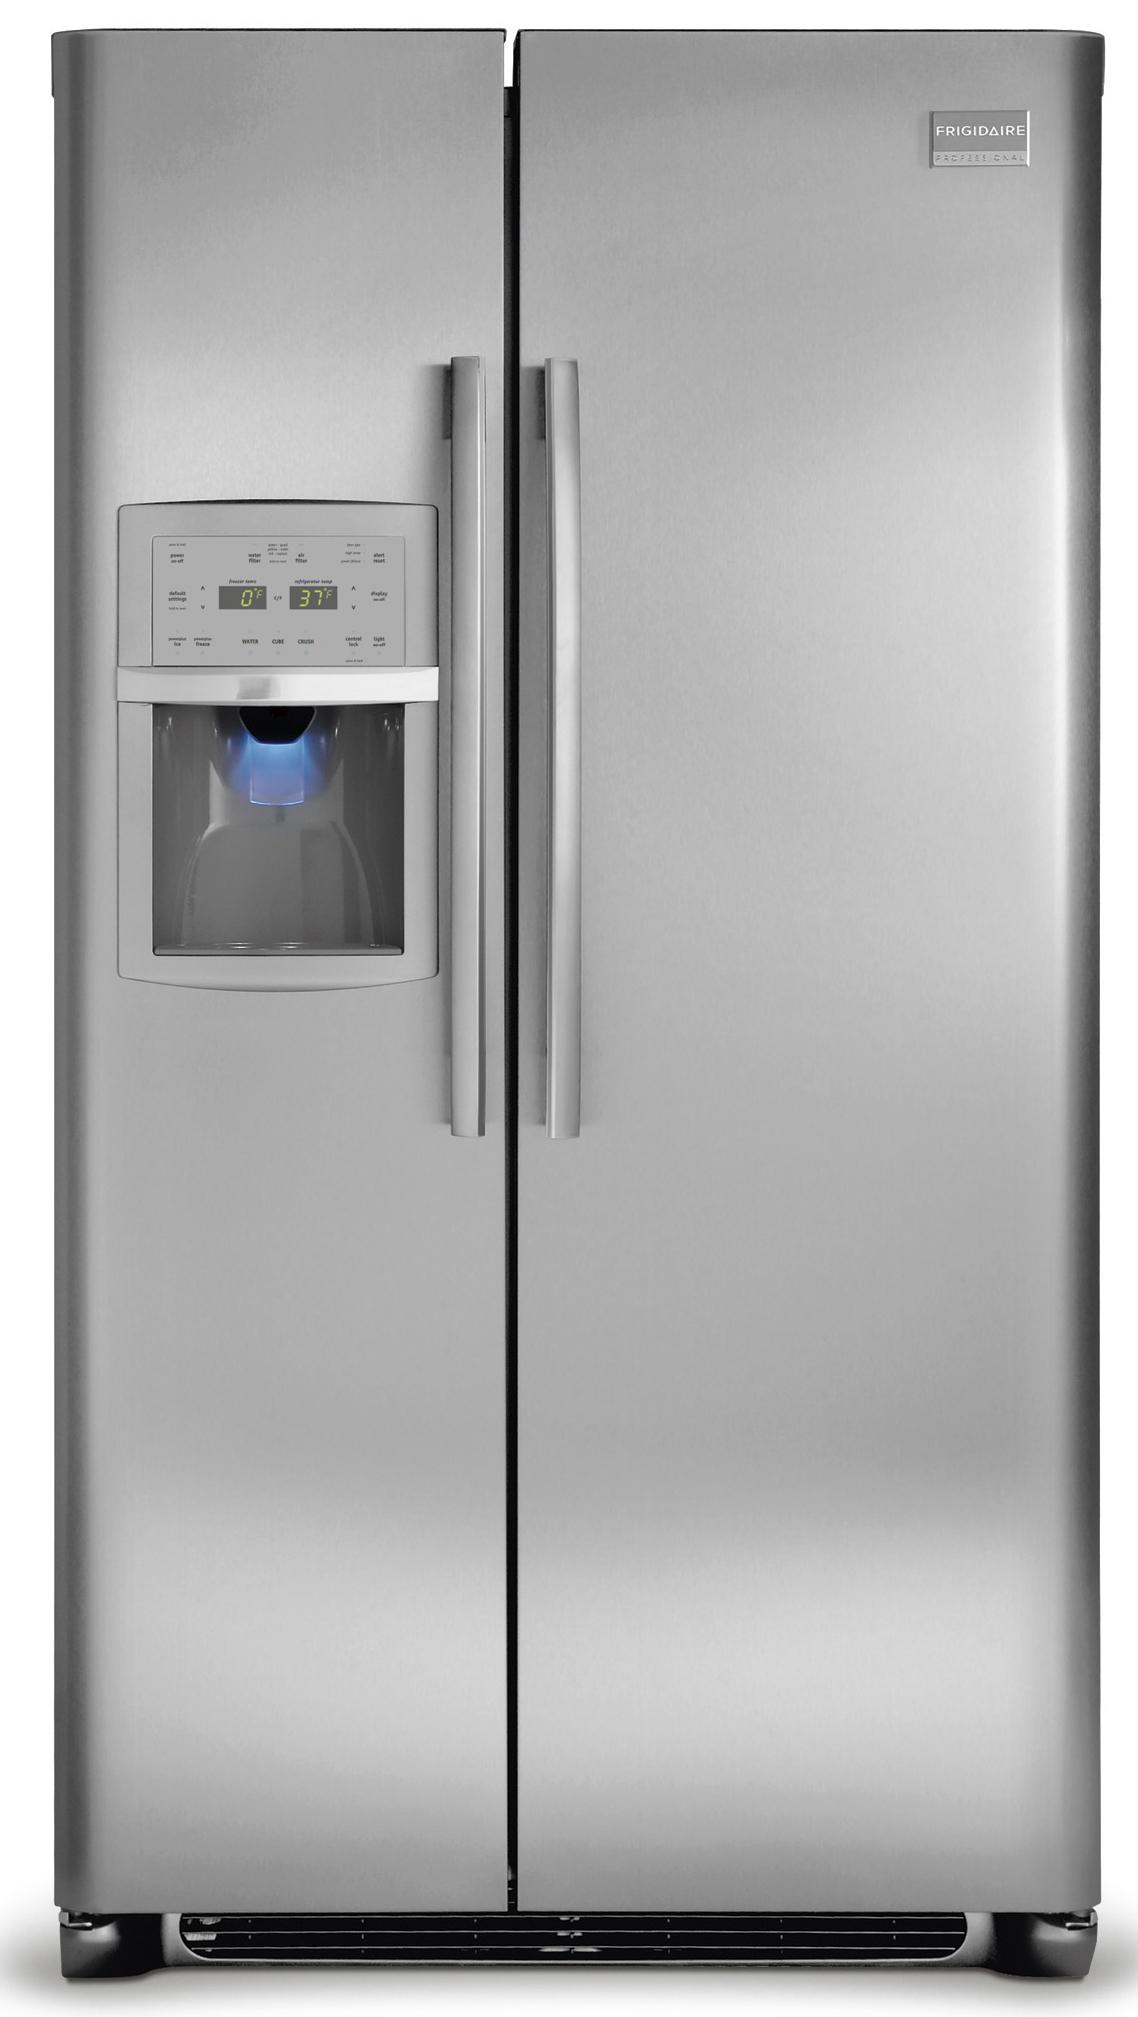 Remarkable Frigidaire Gallery Refrigerator 1138 X 2017 1024 Kb Jpeg